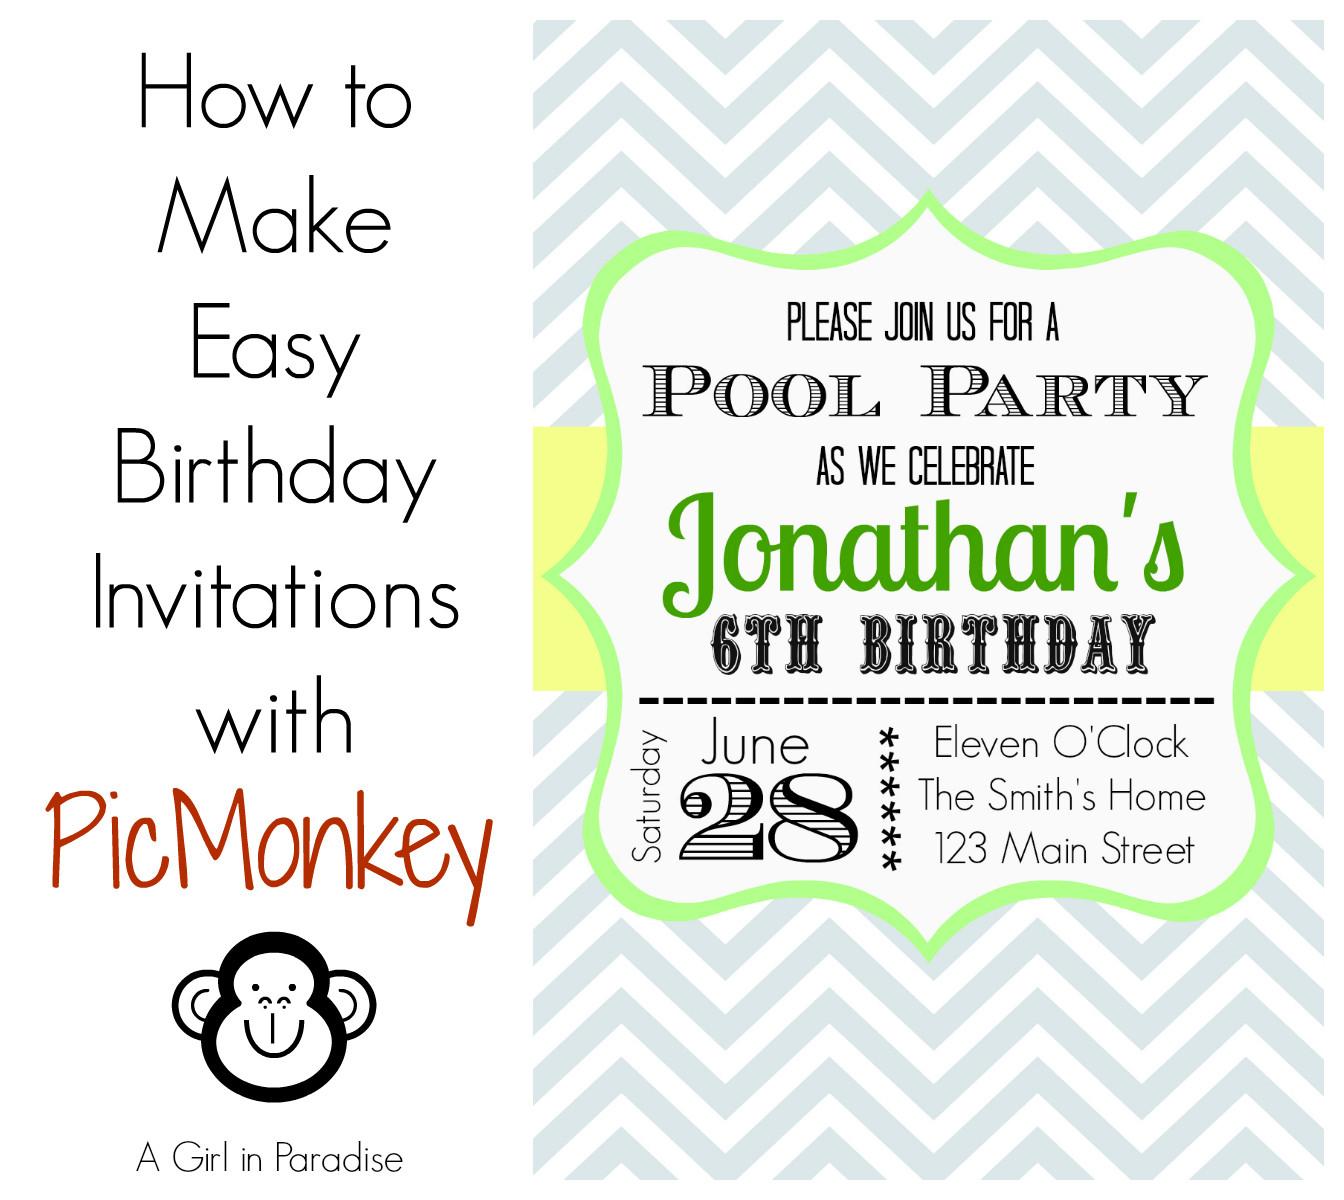 Create Birthday Party Invitations  How to Make Birthday Invitations in Easy Way